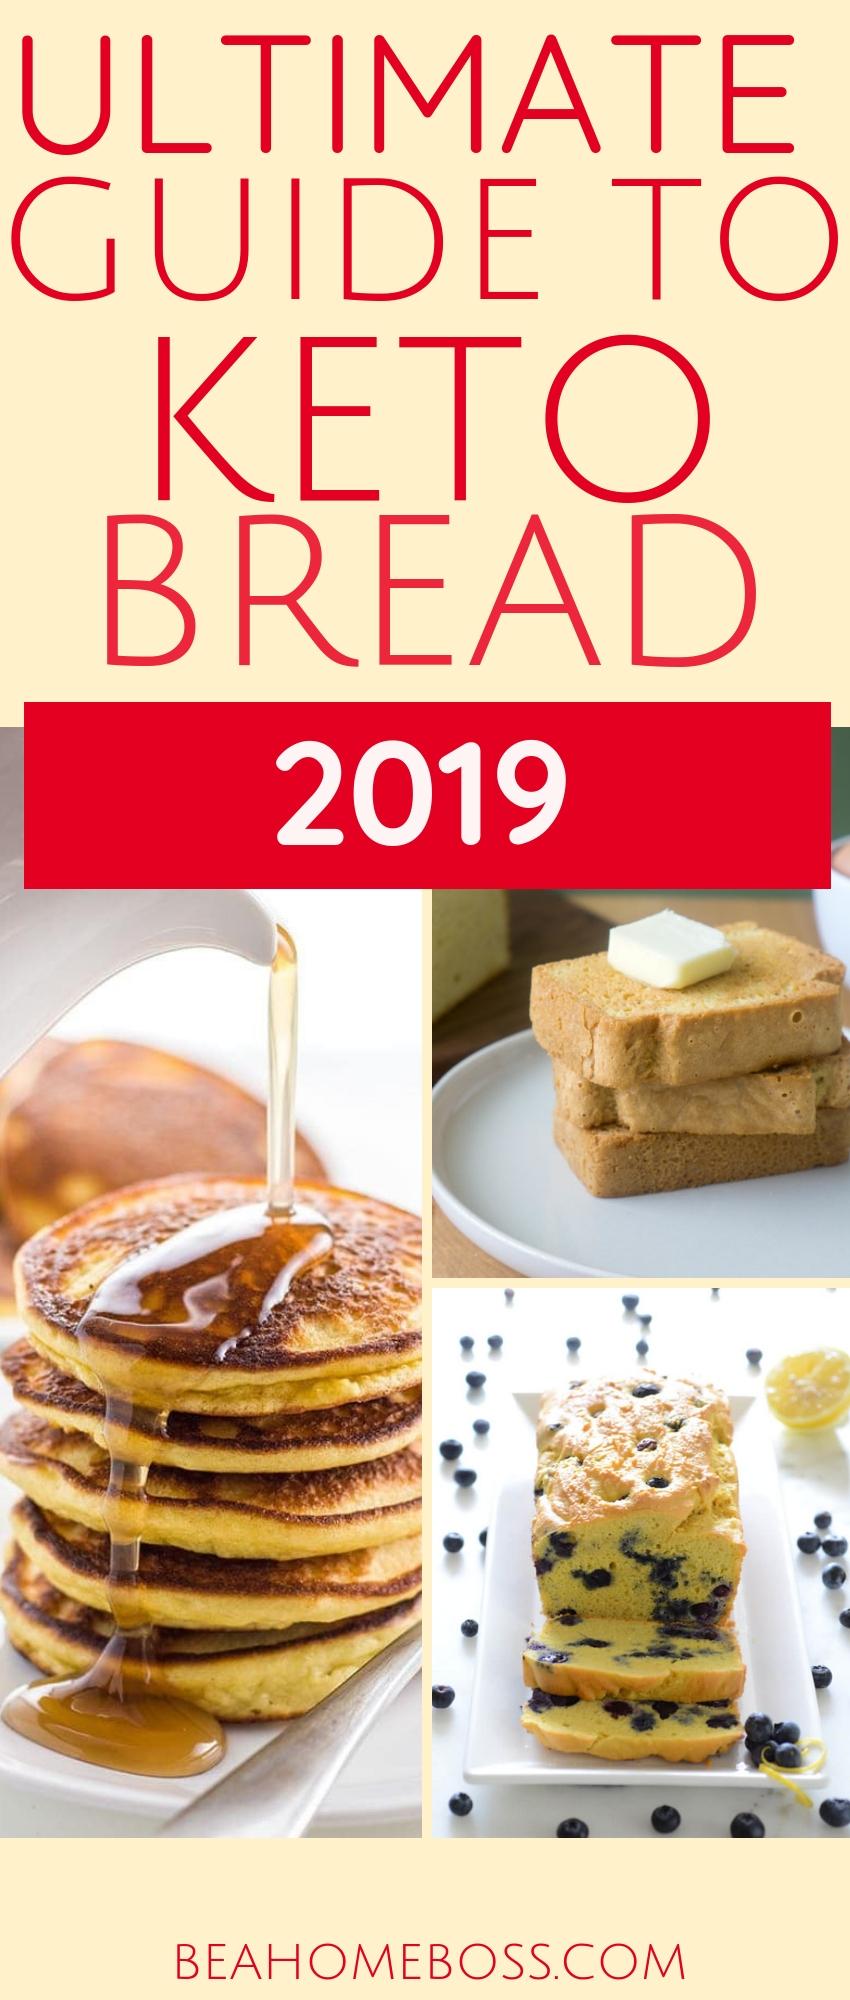 ultimate guide to keto bread.jpg